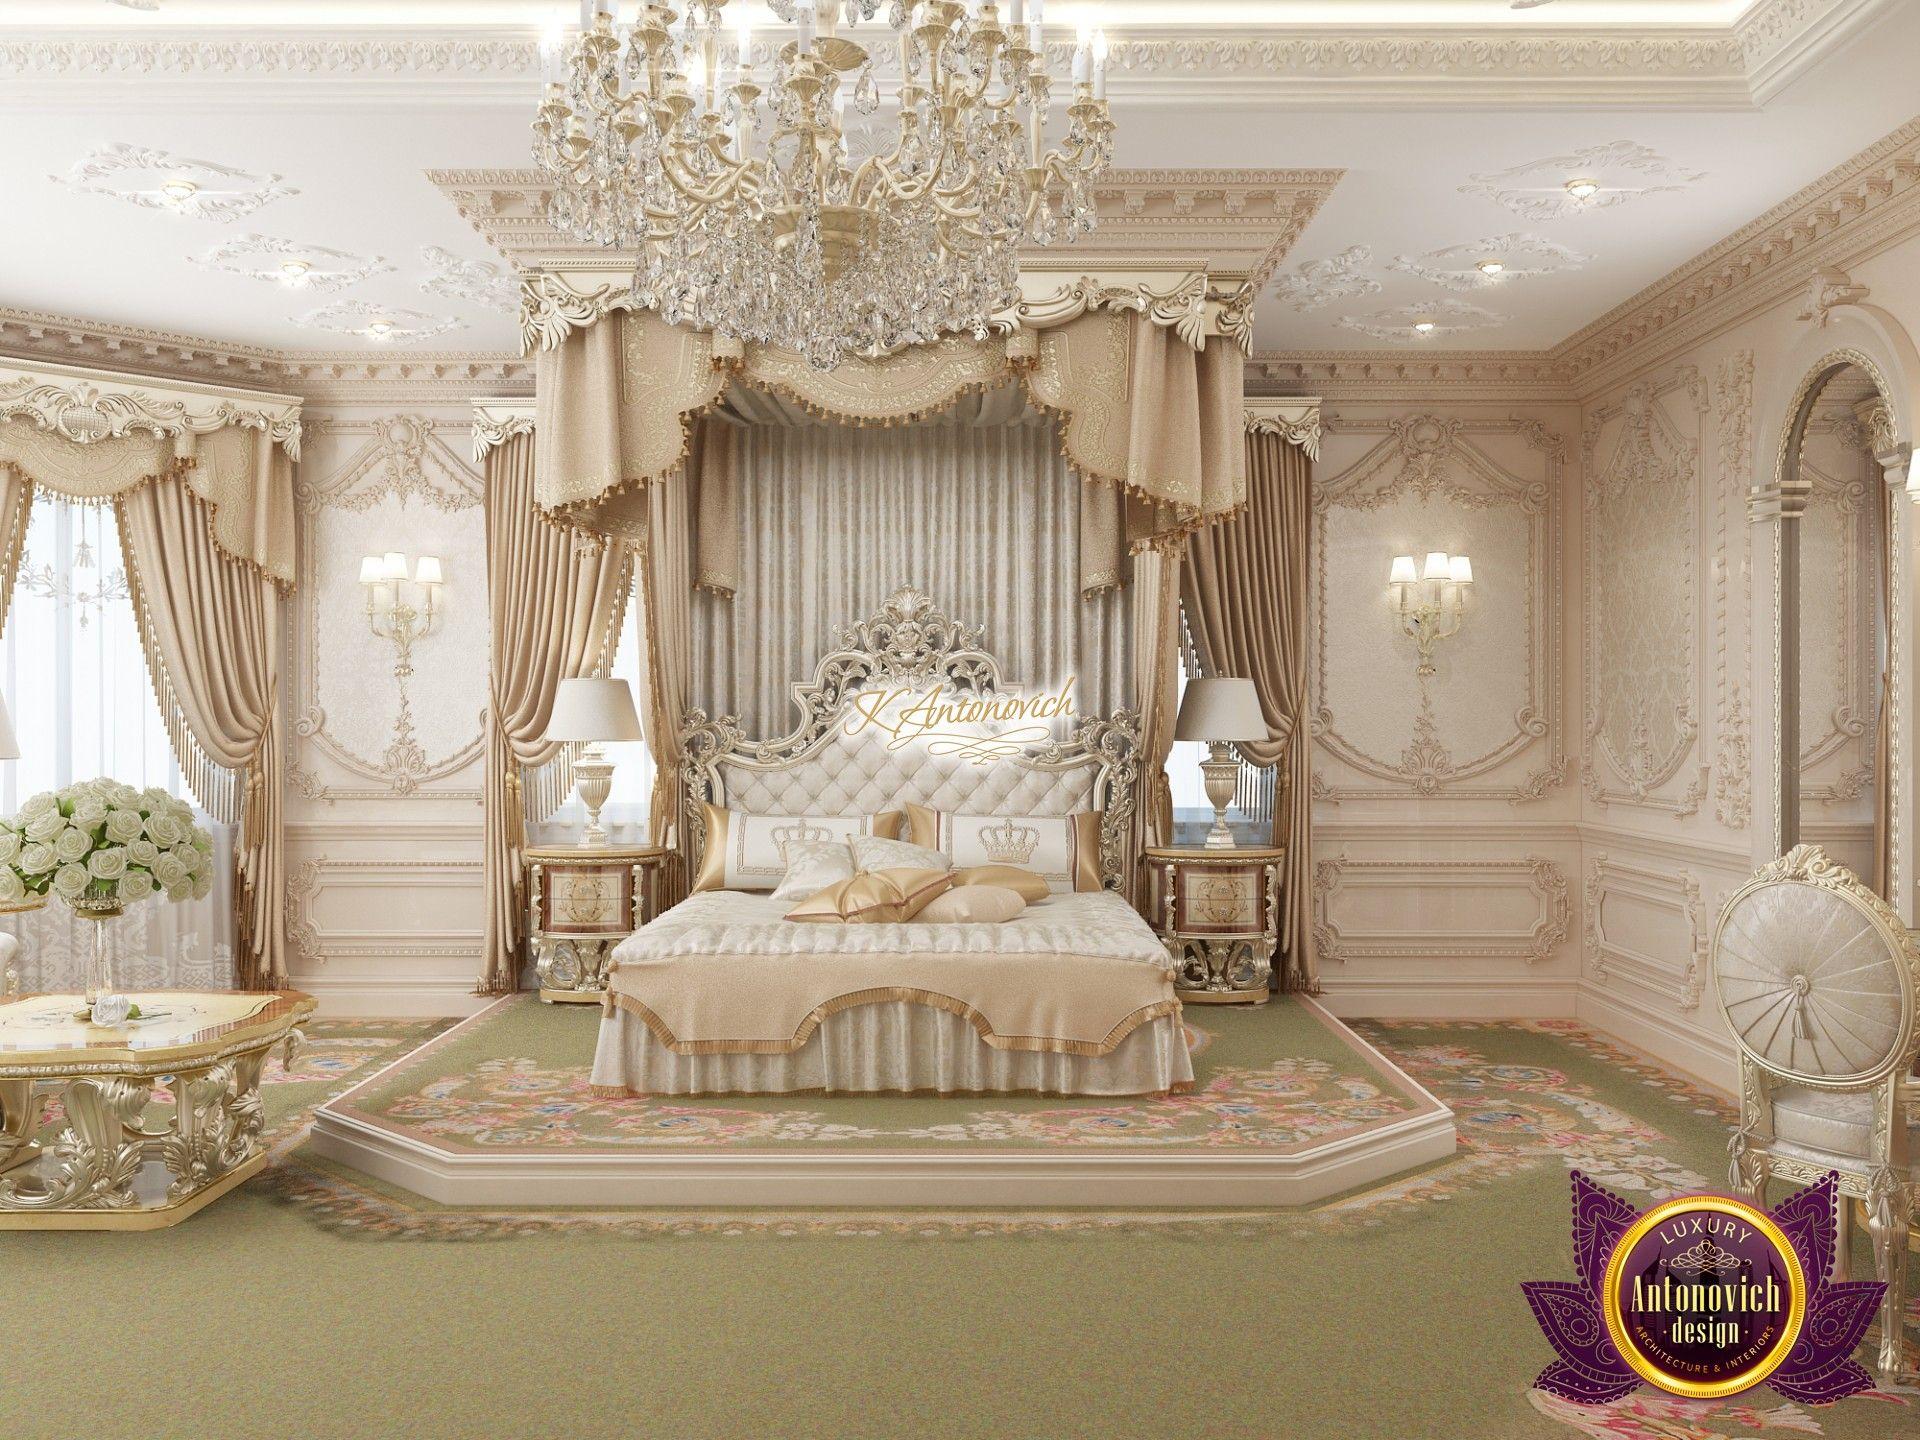 By Antonovich Design  Dream master bedroom, Luxurious bedrooms